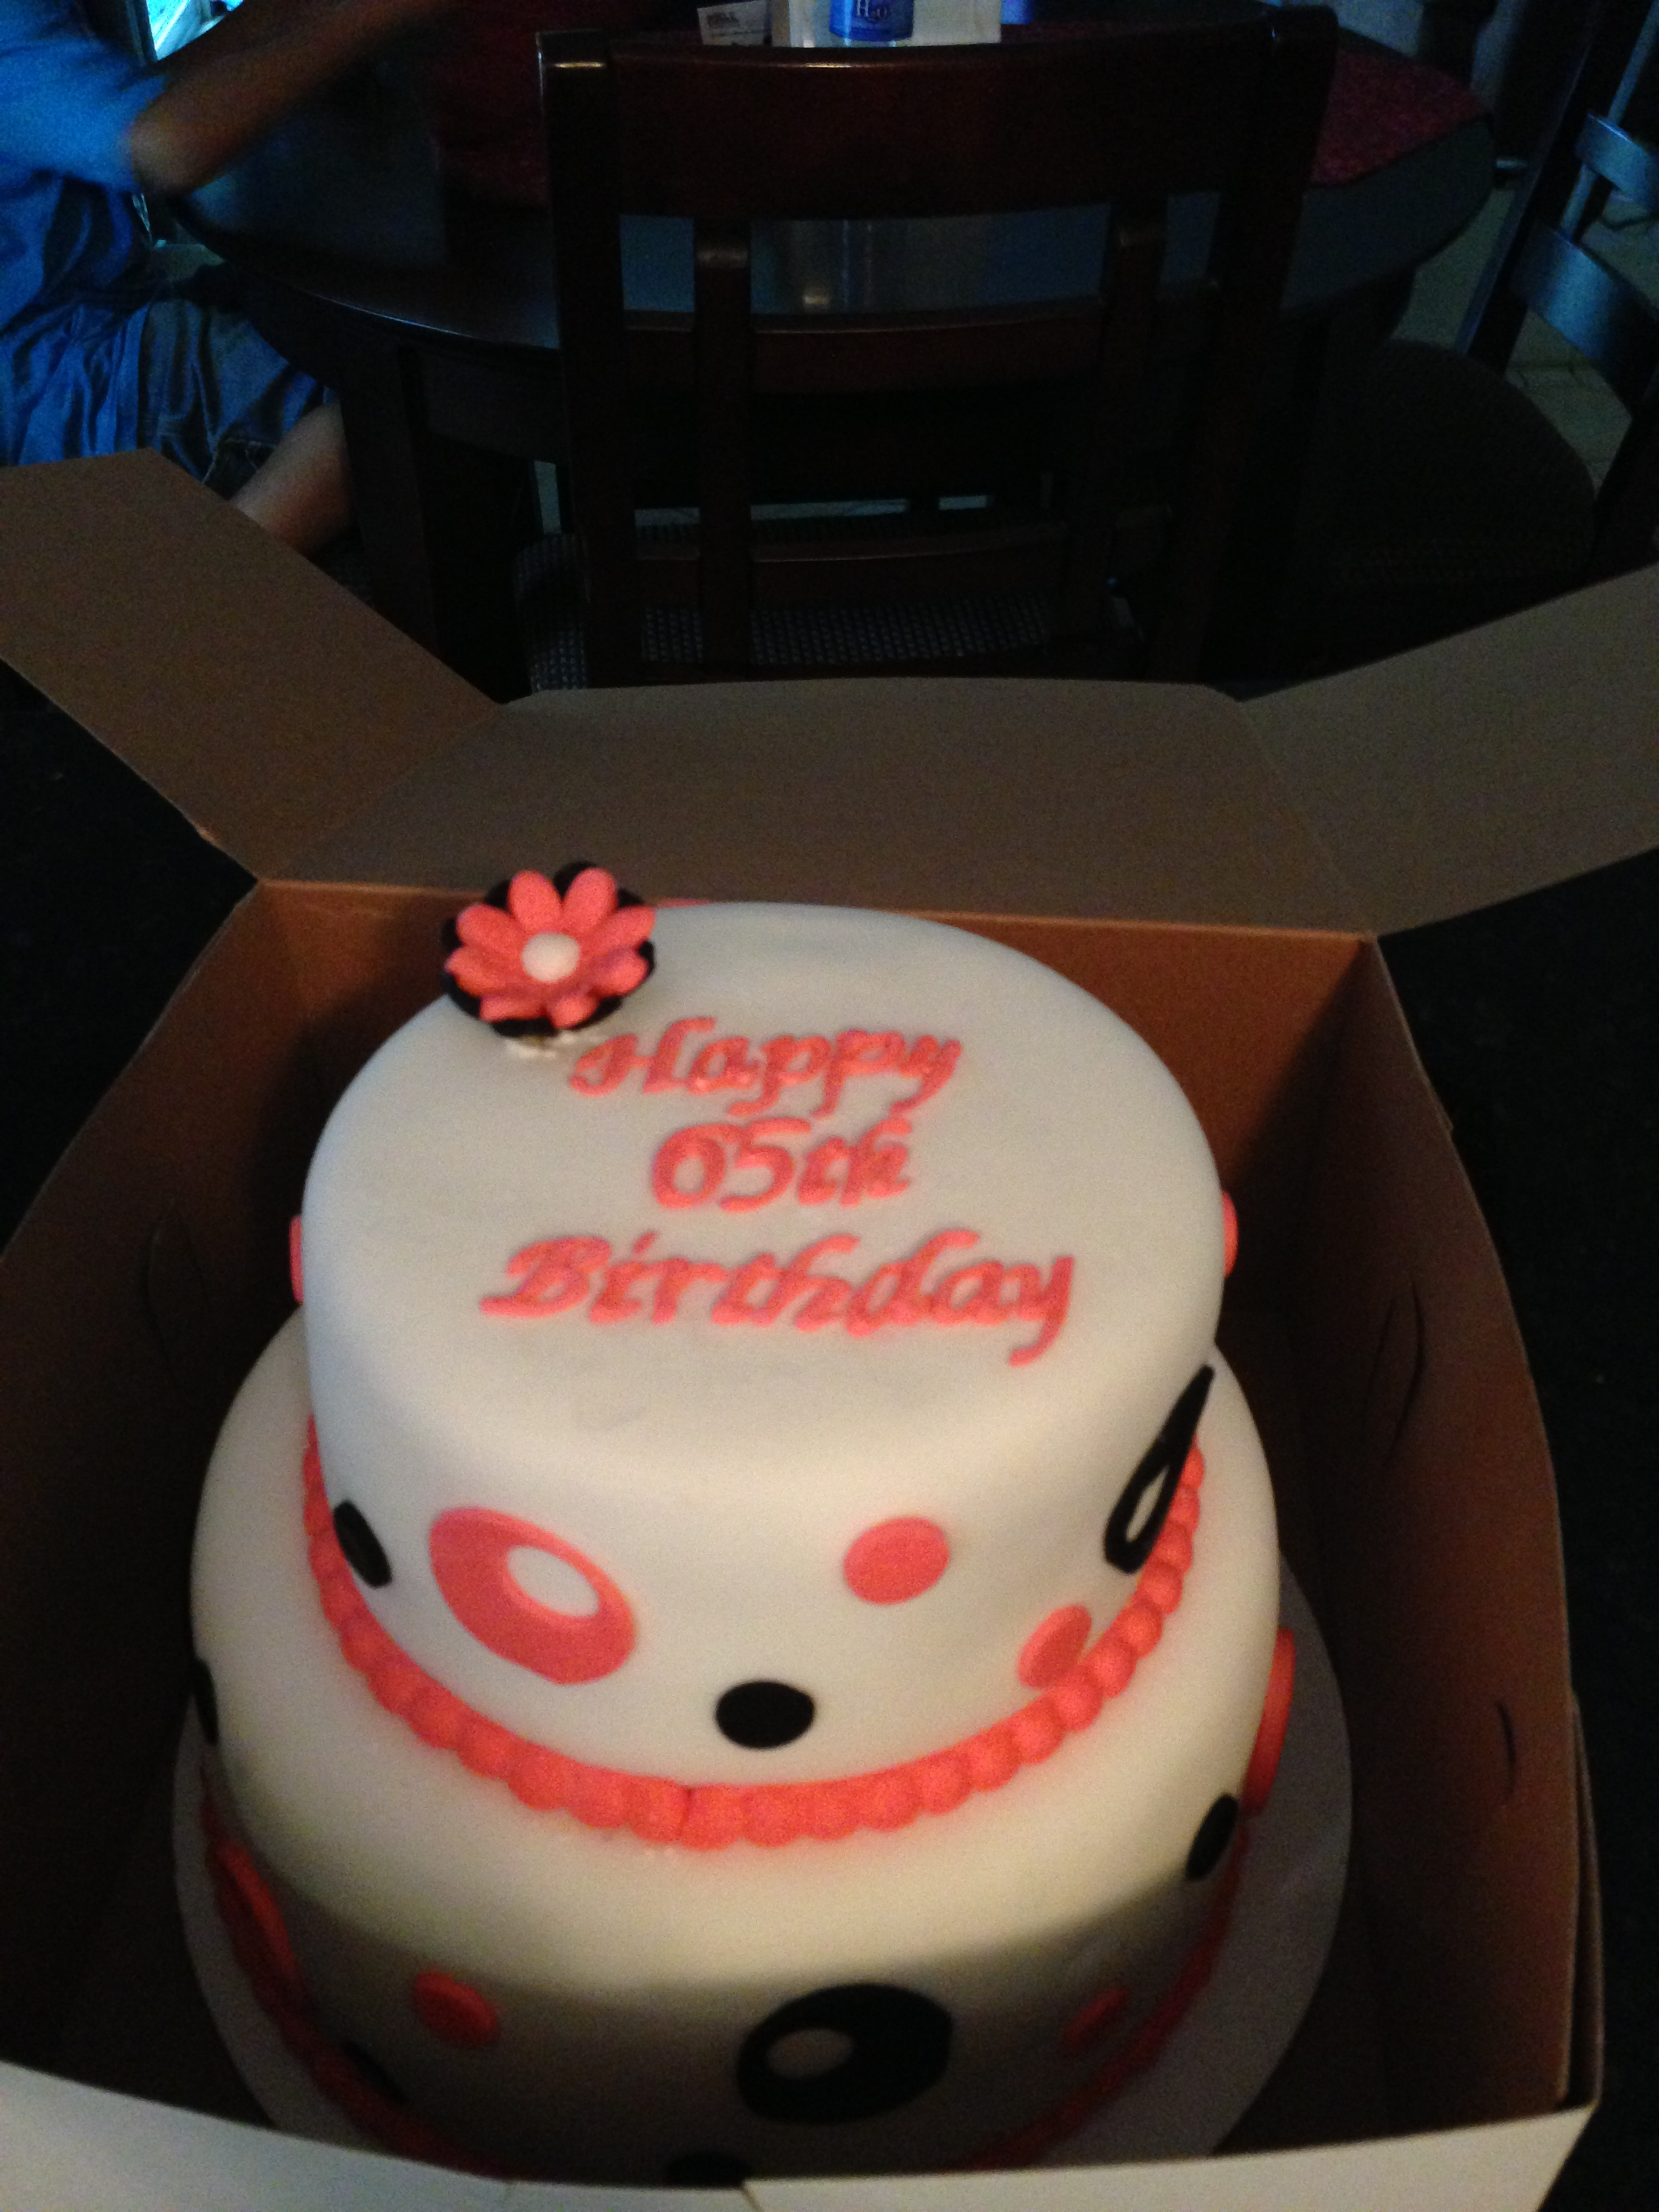 Happy 65th Birthday Cake